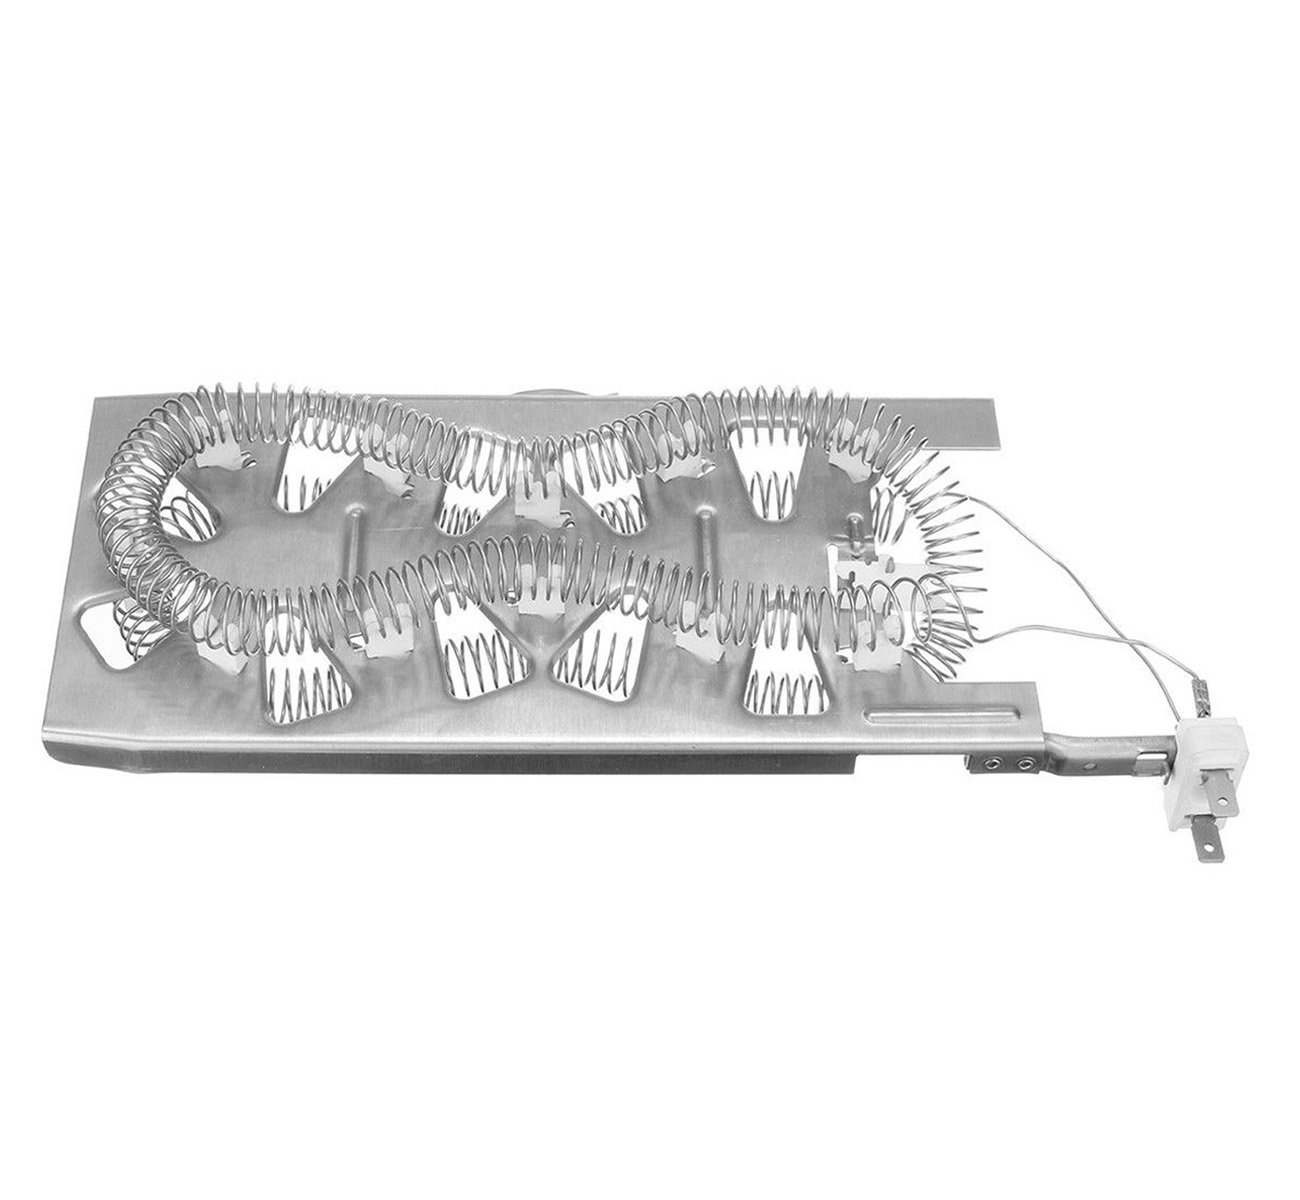 Siwdoy 3387747 Dryer Heating Element For Whirlpool Kenmore Maytag Dryer WP3387747 8527865 AP6008281 AP2947033 PS344597